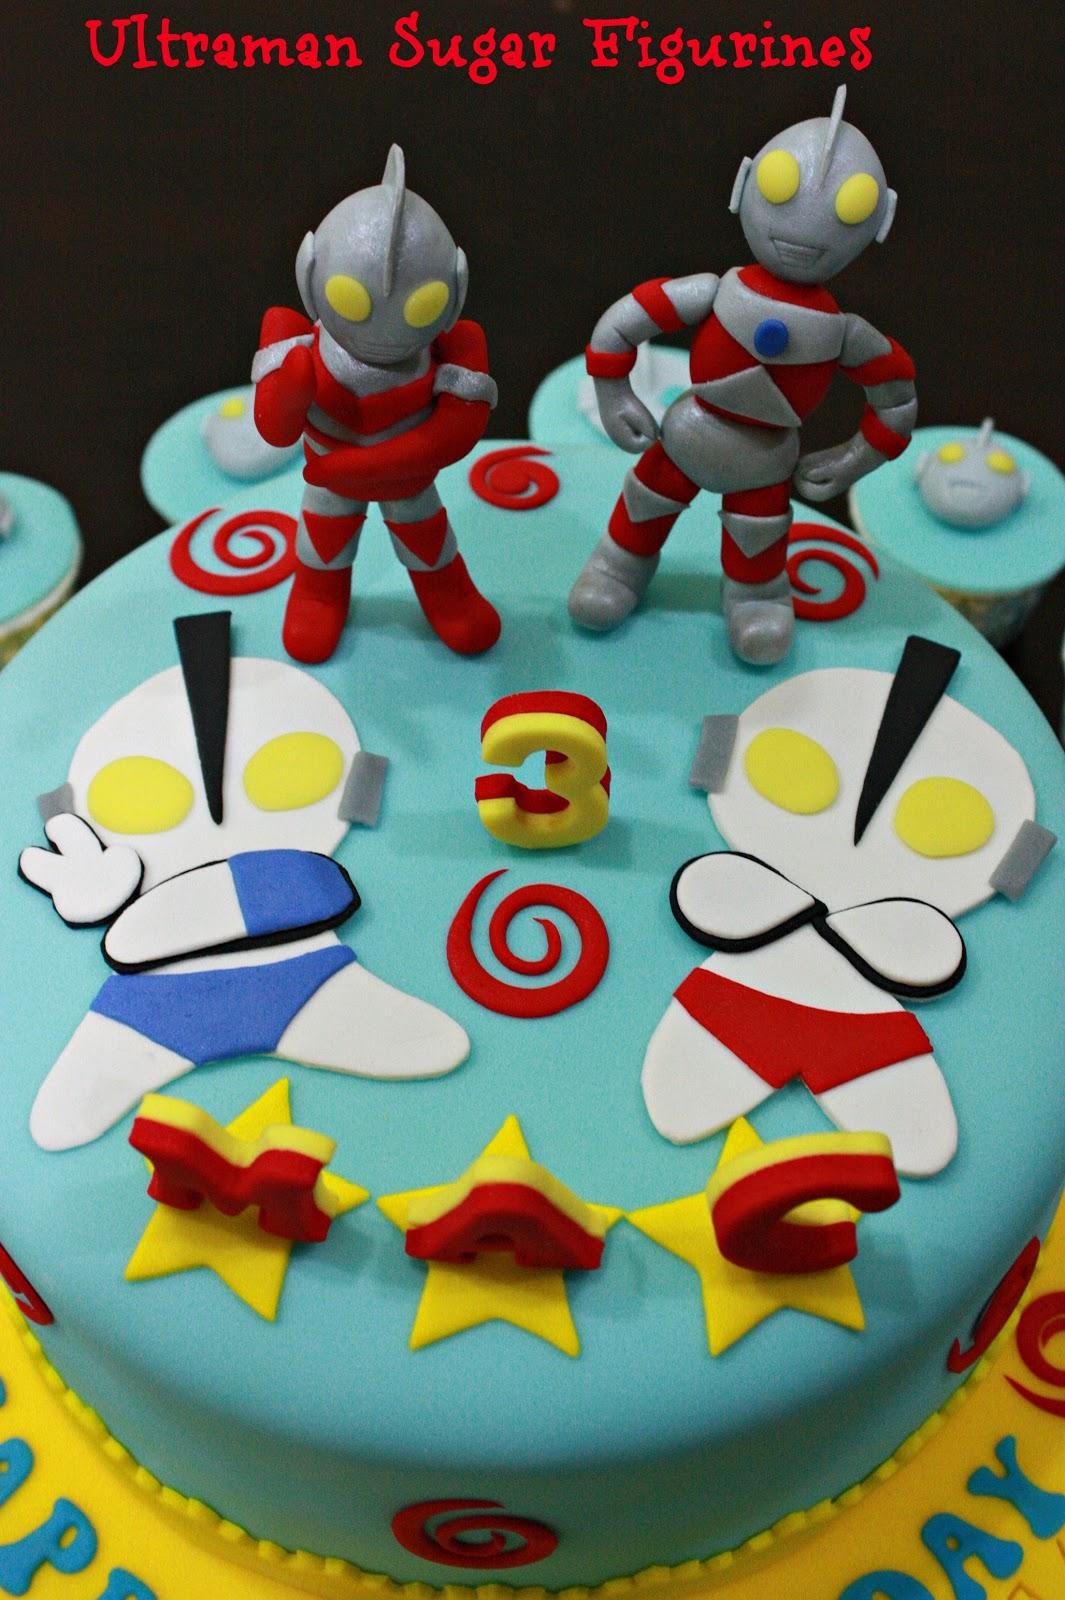 Ultraman Birthday Cake Design : Sheny s Homemade Treats: Ultraman Themed Cake and Cupcakes